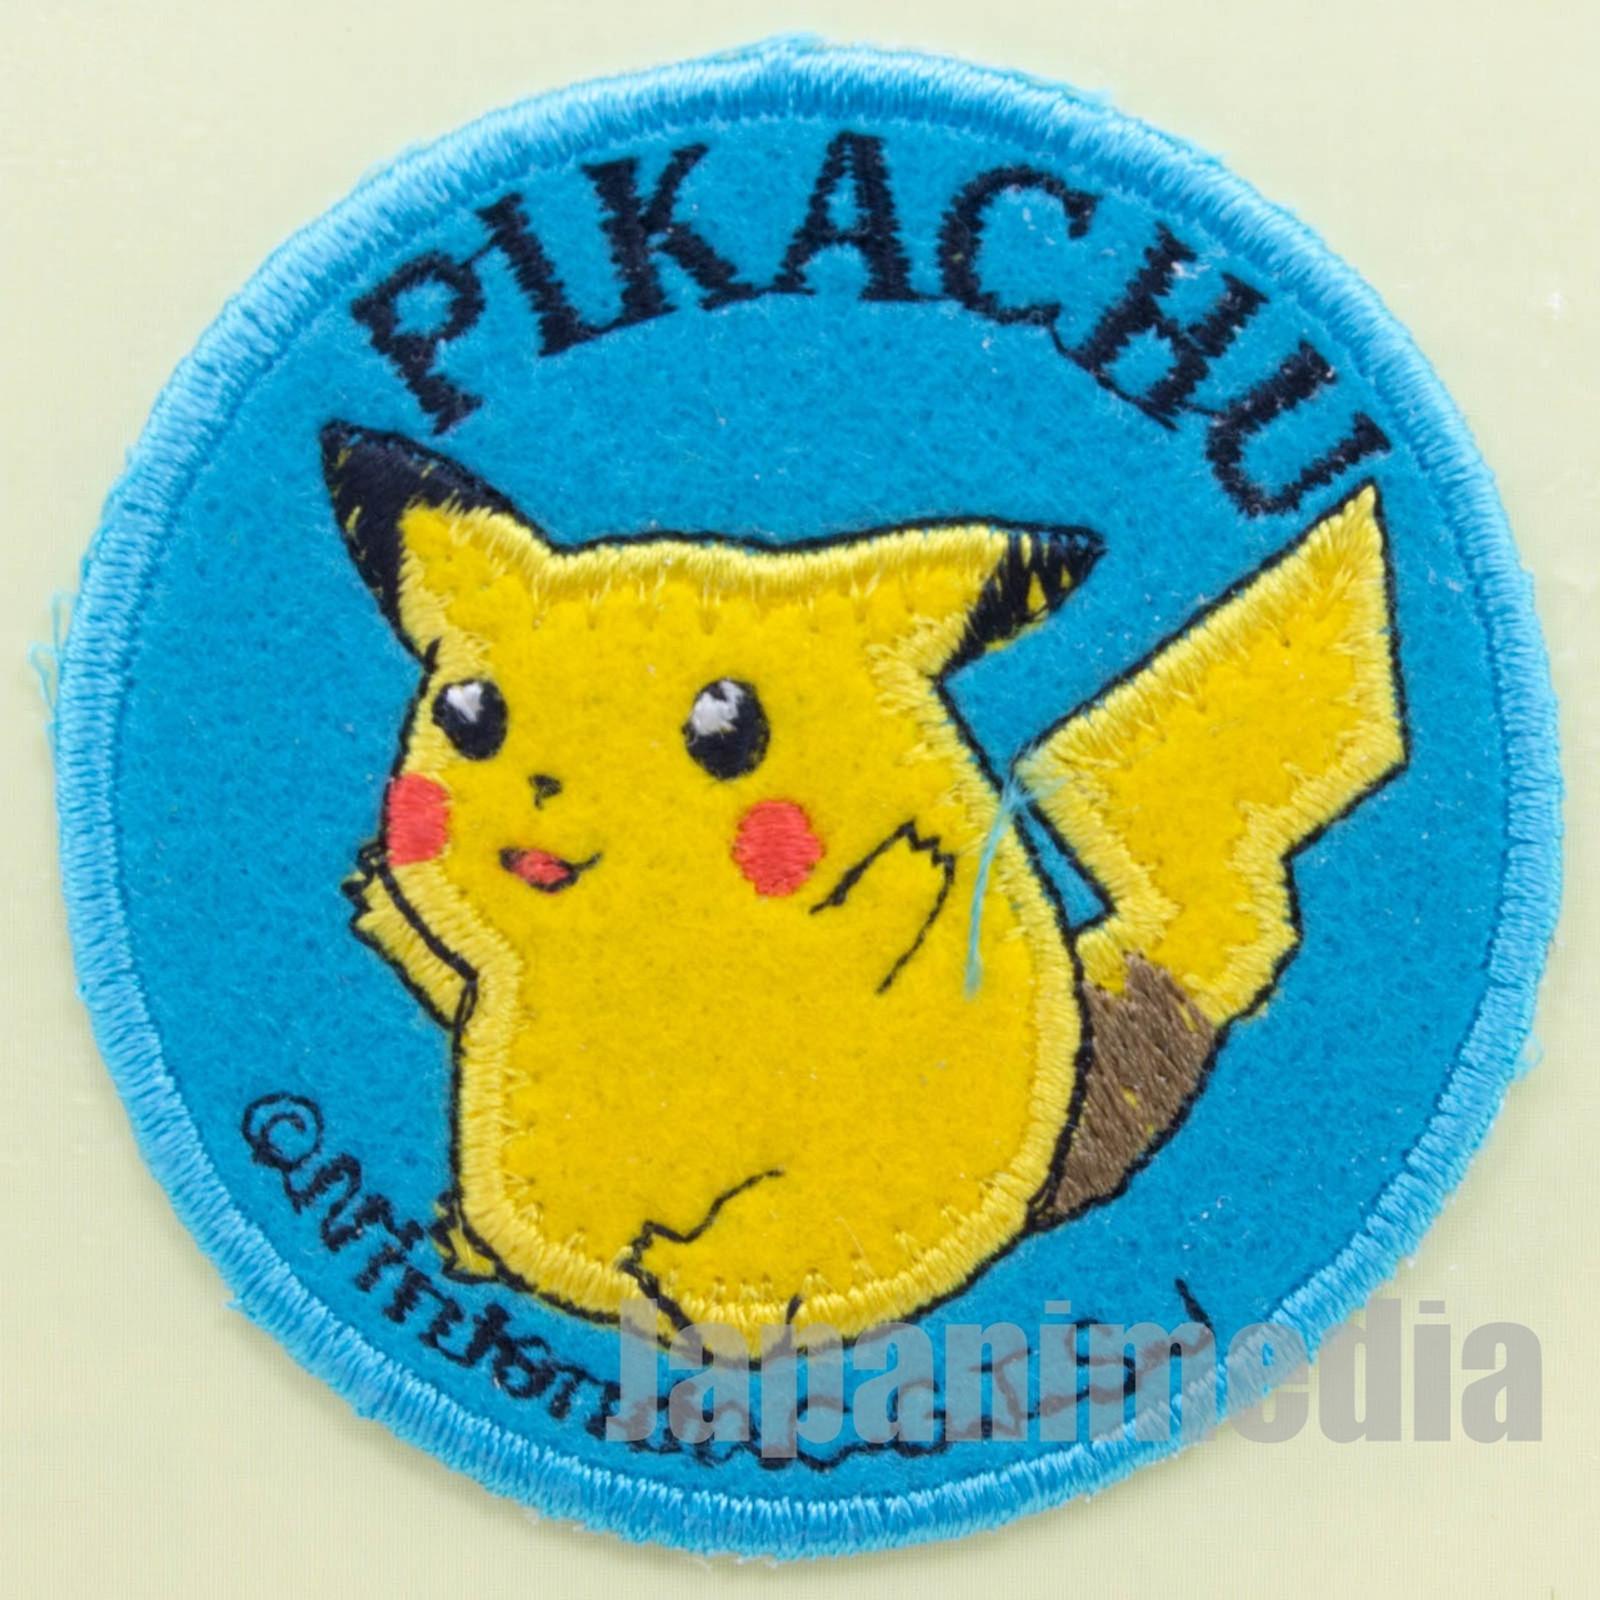 Pokemon Pikachu Interfacing Patch Badge Pocket Monsters JAPAN ANIME GAME